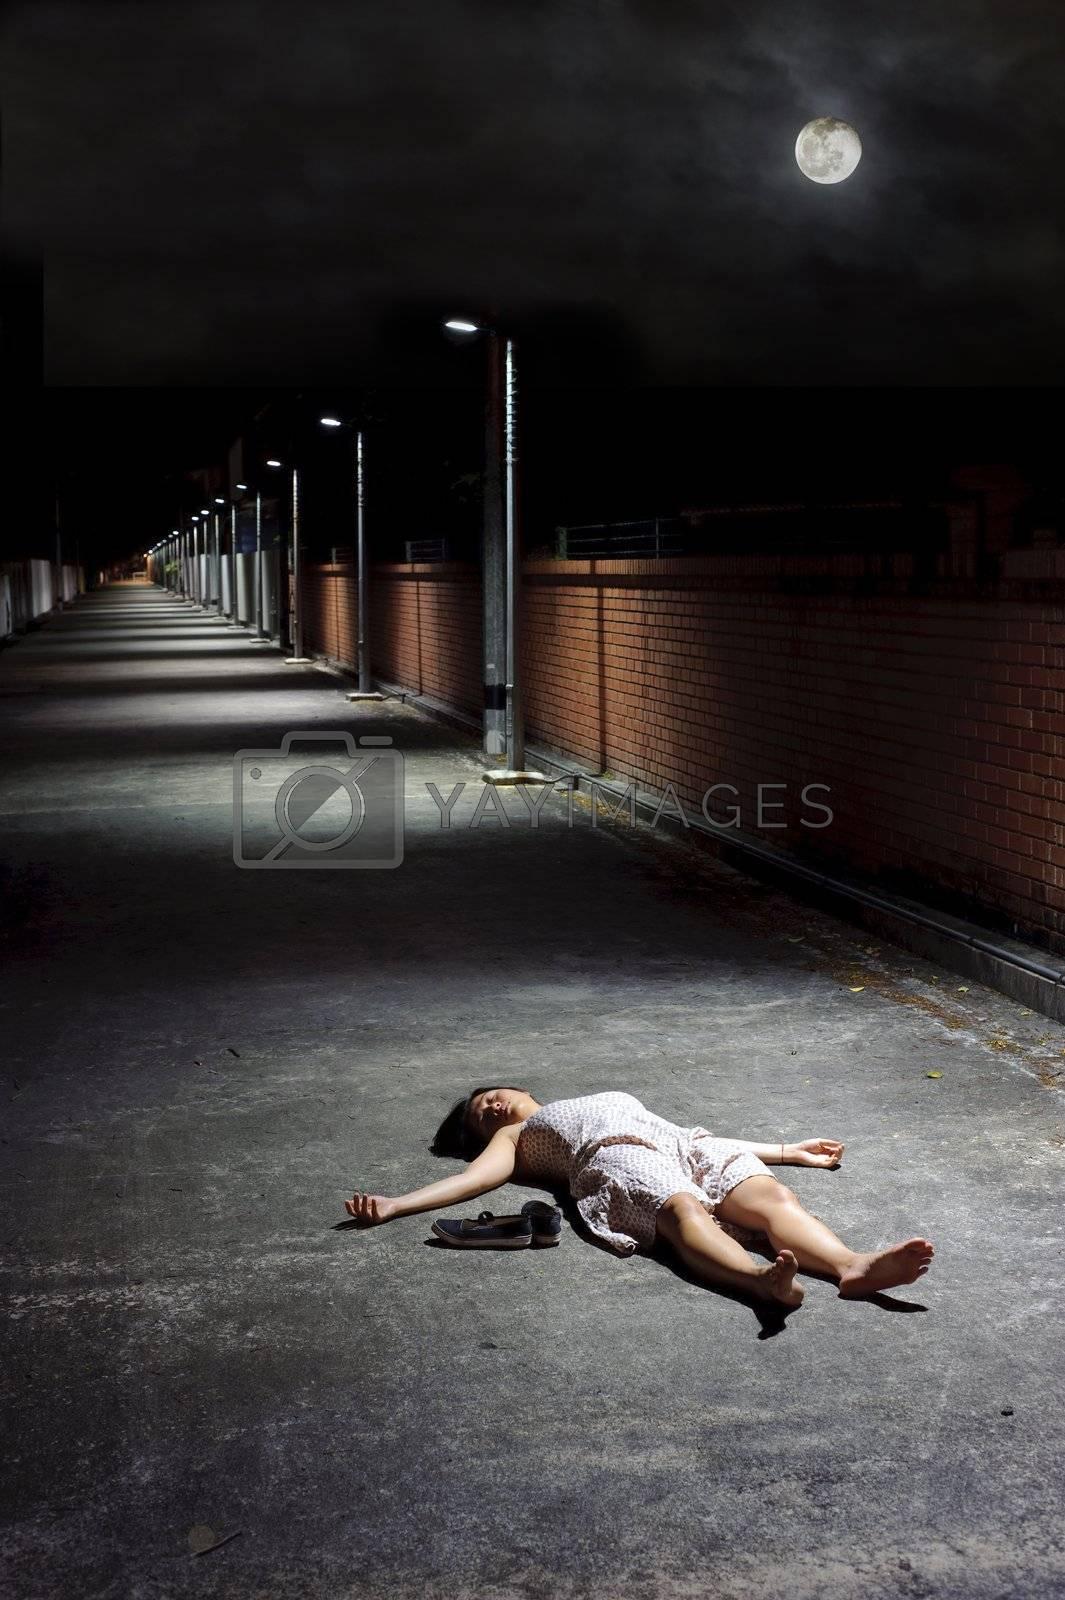 Female lies dead in the street under a night sky